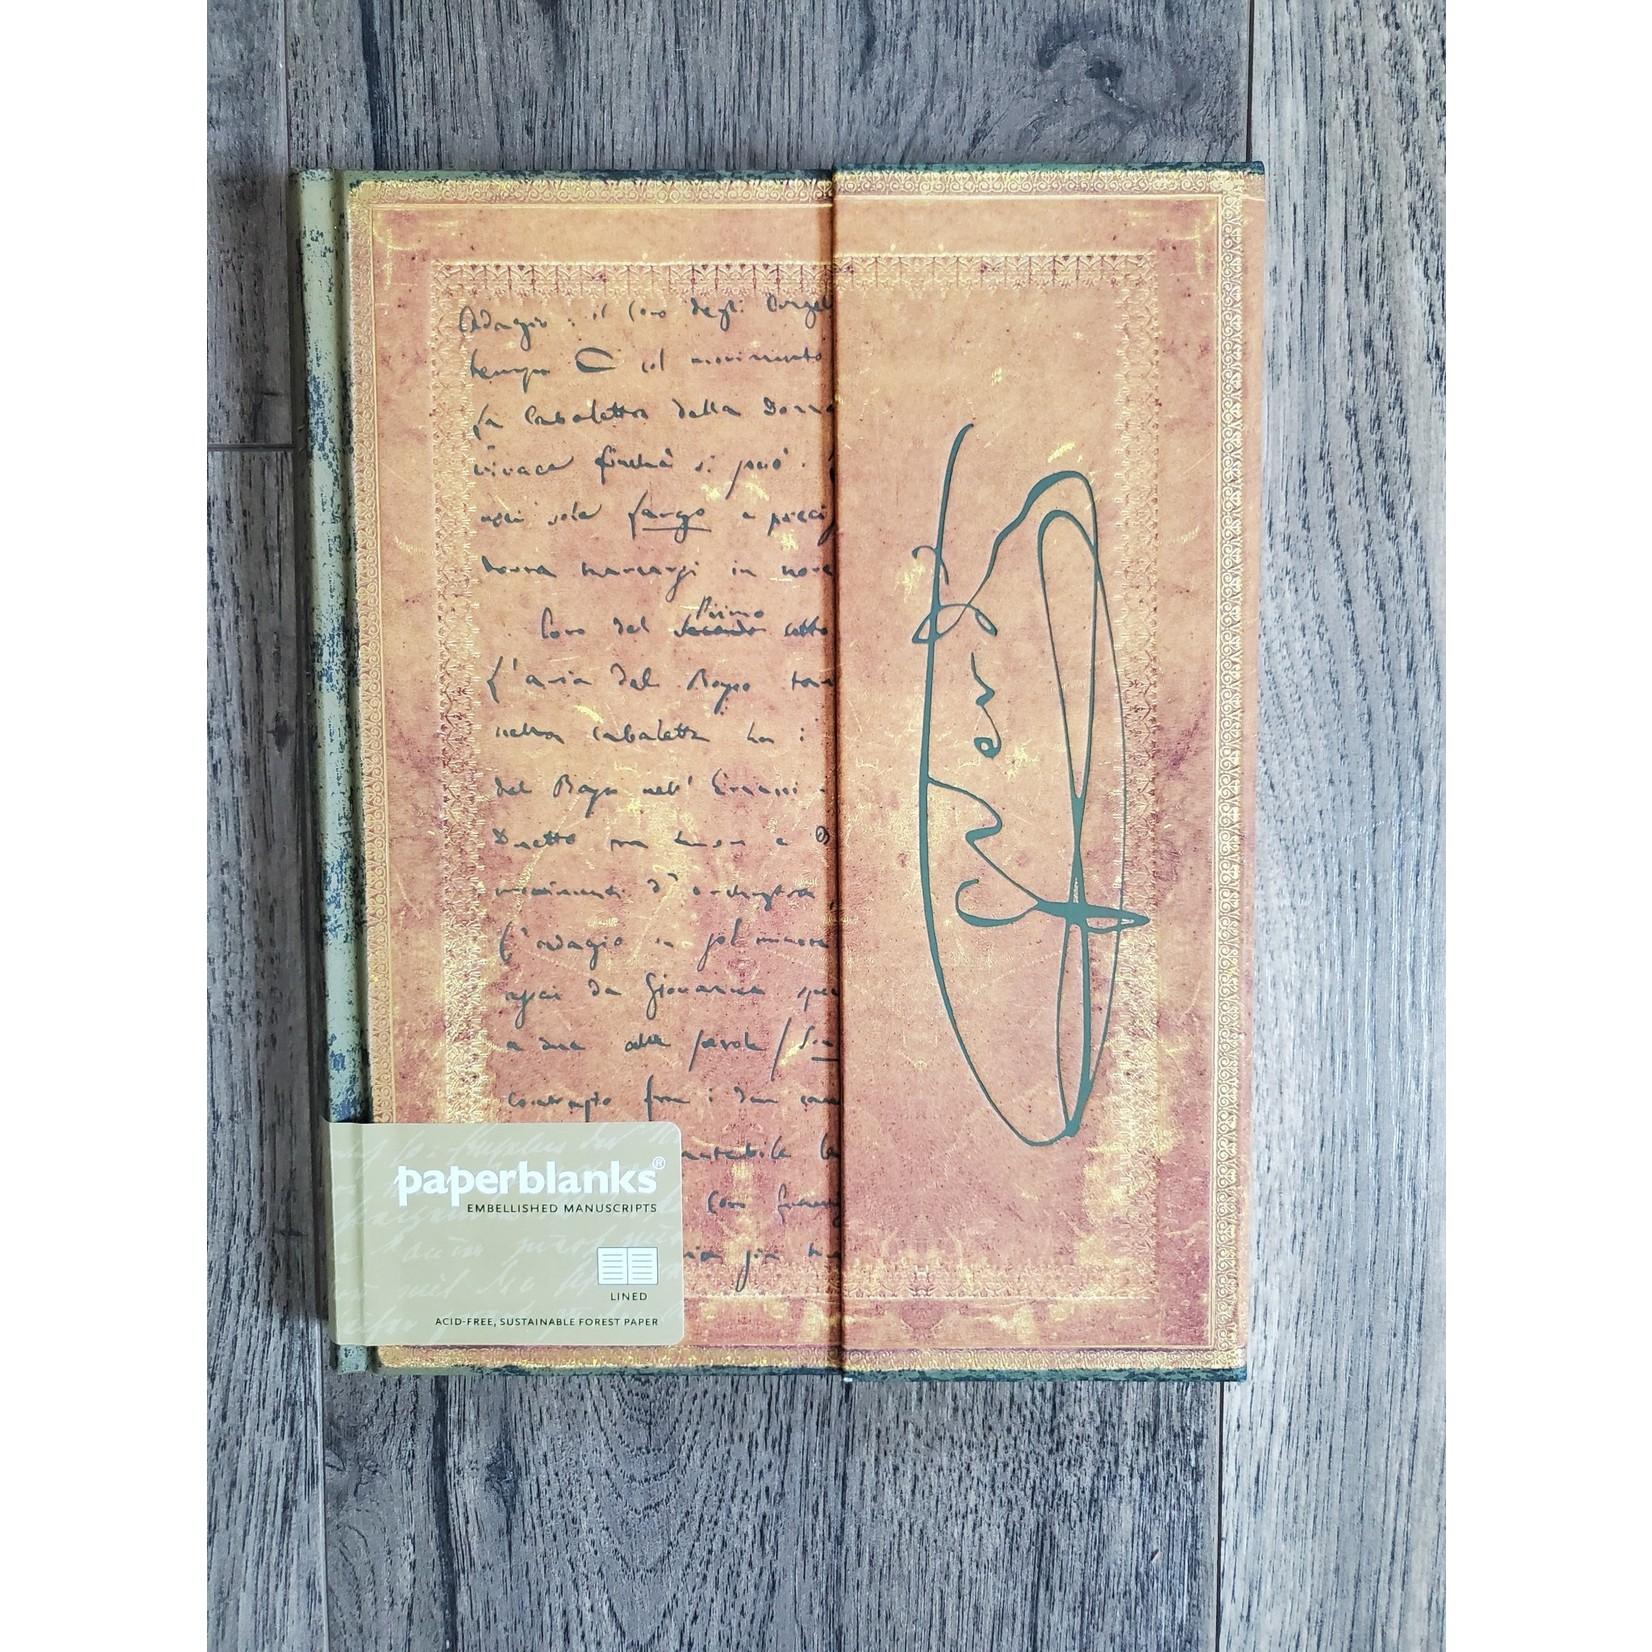 Paperblanks Verdi, Carteggio Journal